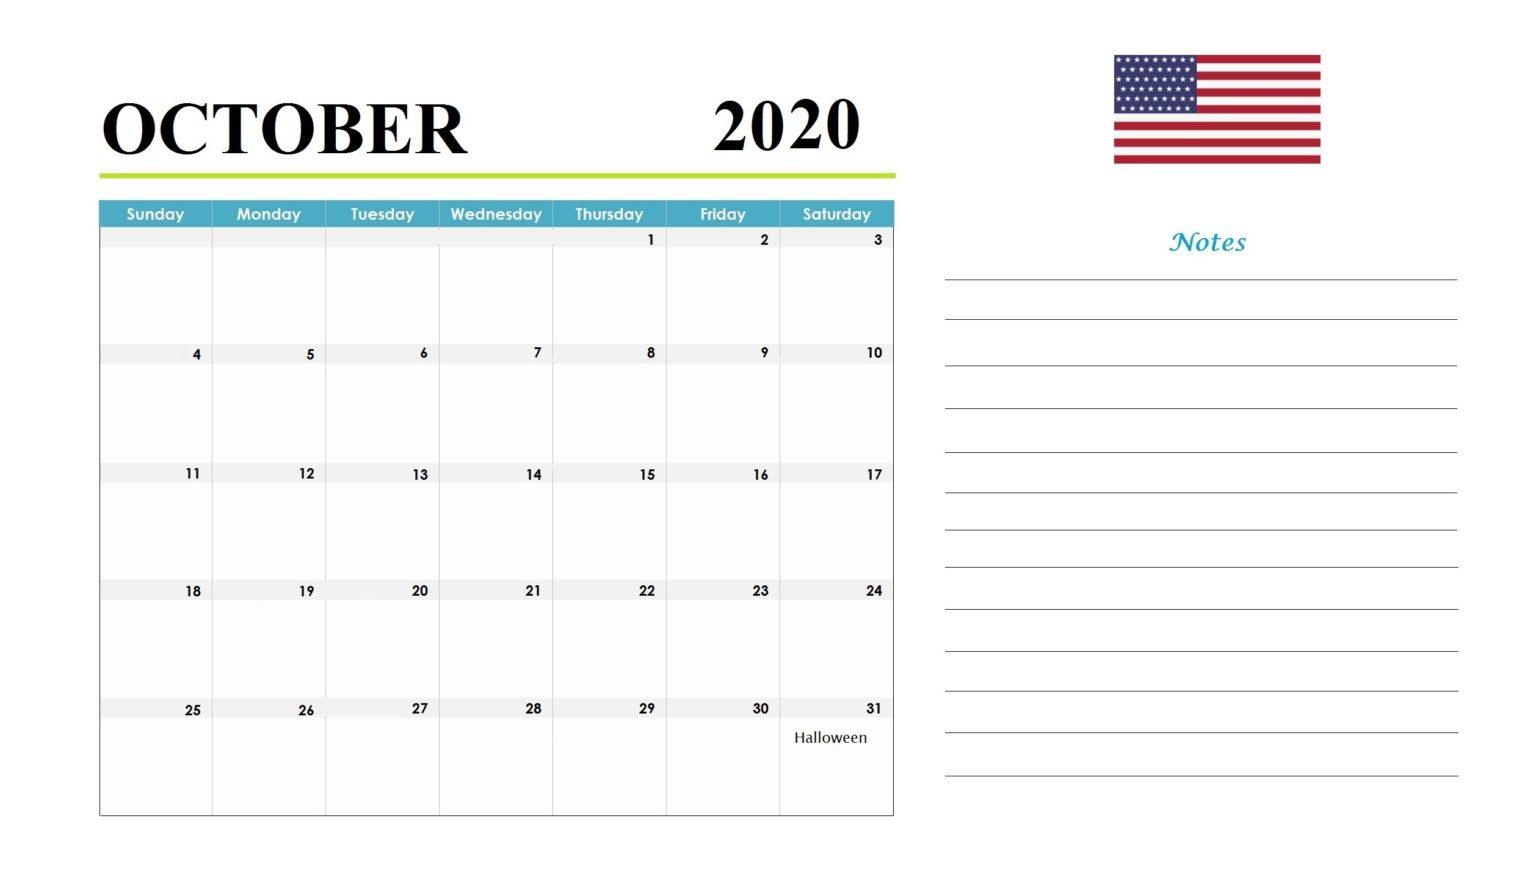 October 2020 Holidays Calendar